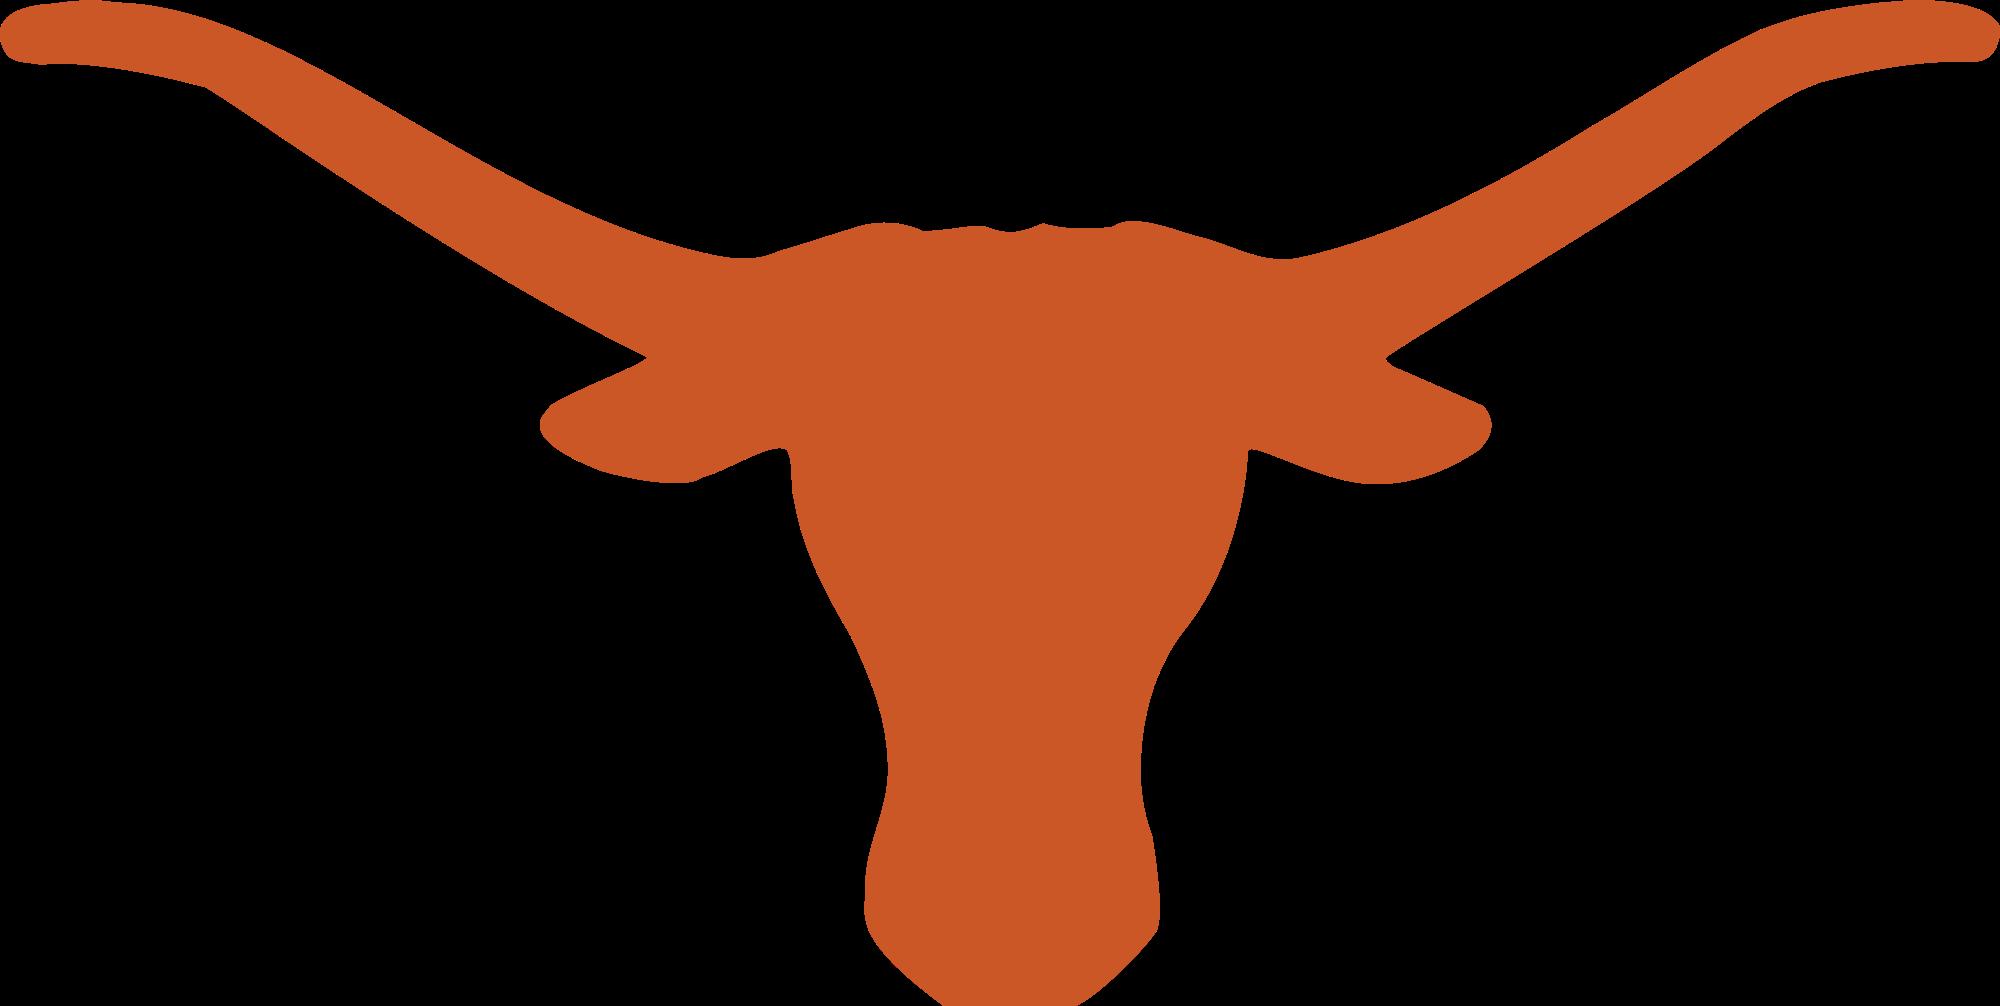 2000x1006 University Of Texas Texas Hockey